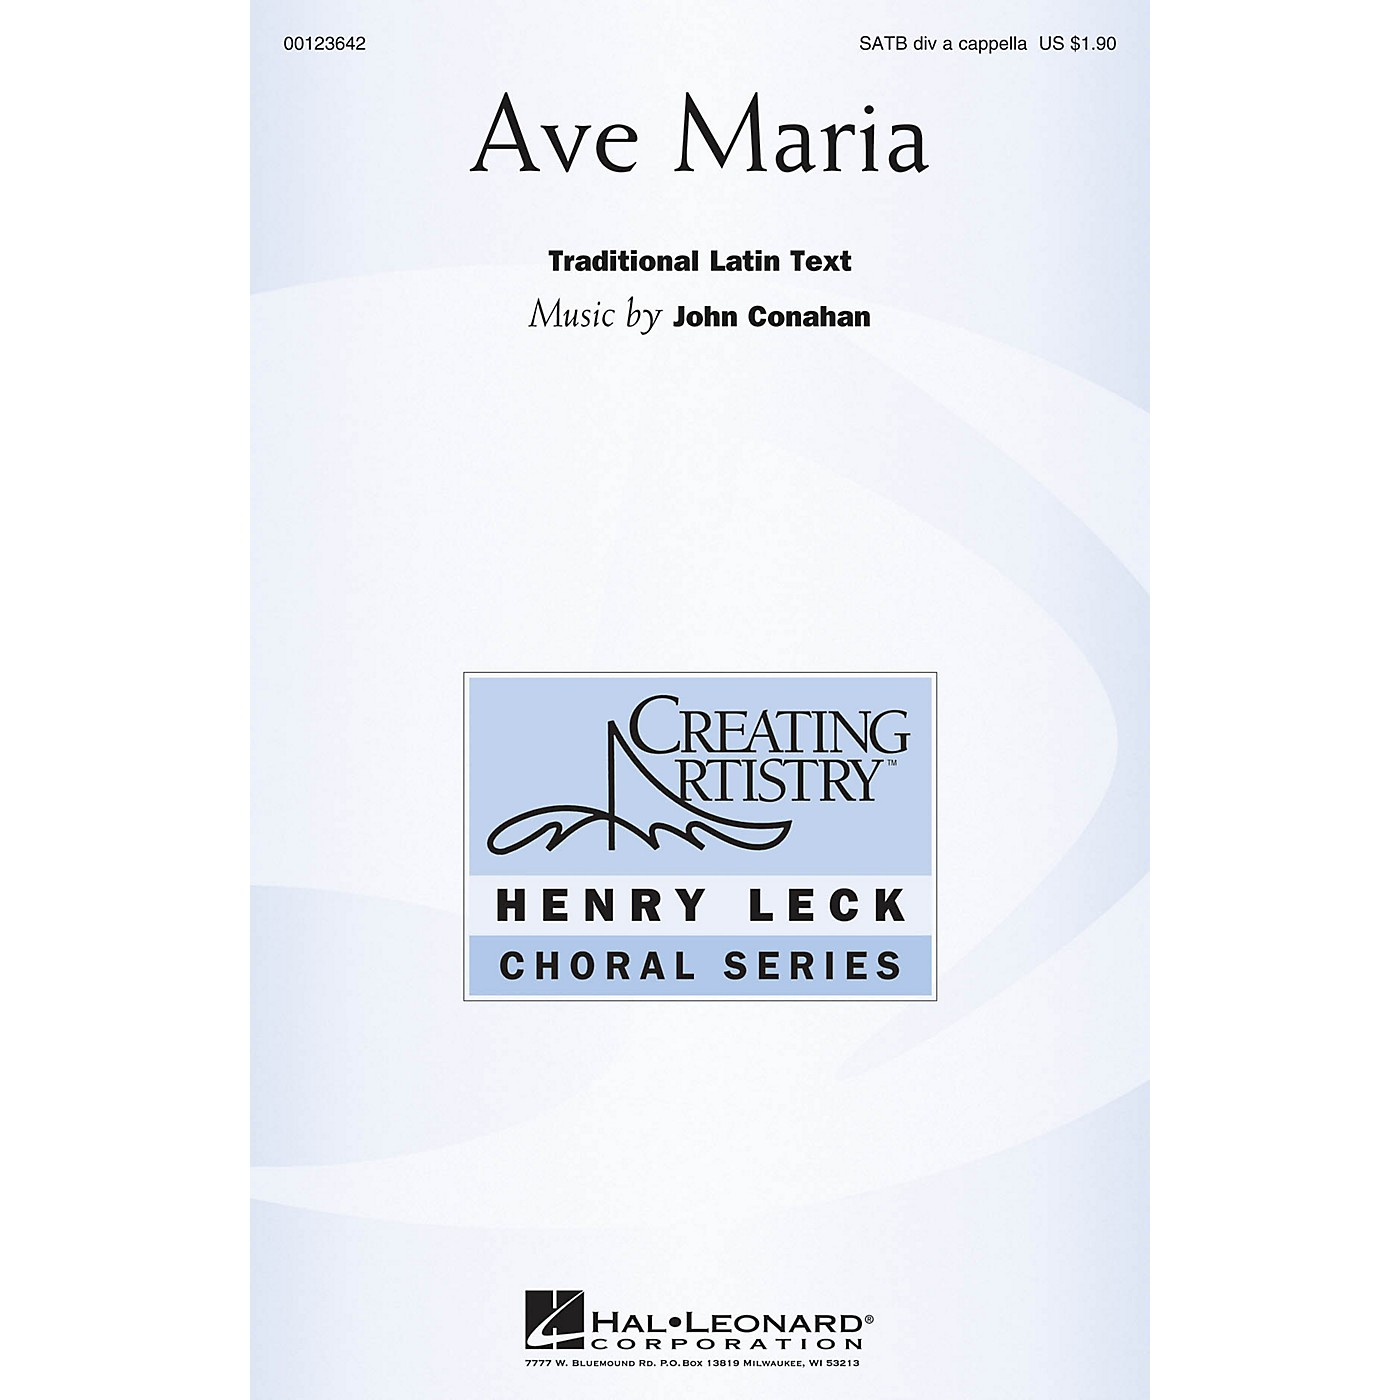 Hal Leonard Ave Maria (Henry Leck Choral Series) SATB DV A Cappella composed by John Conahan thumbnail